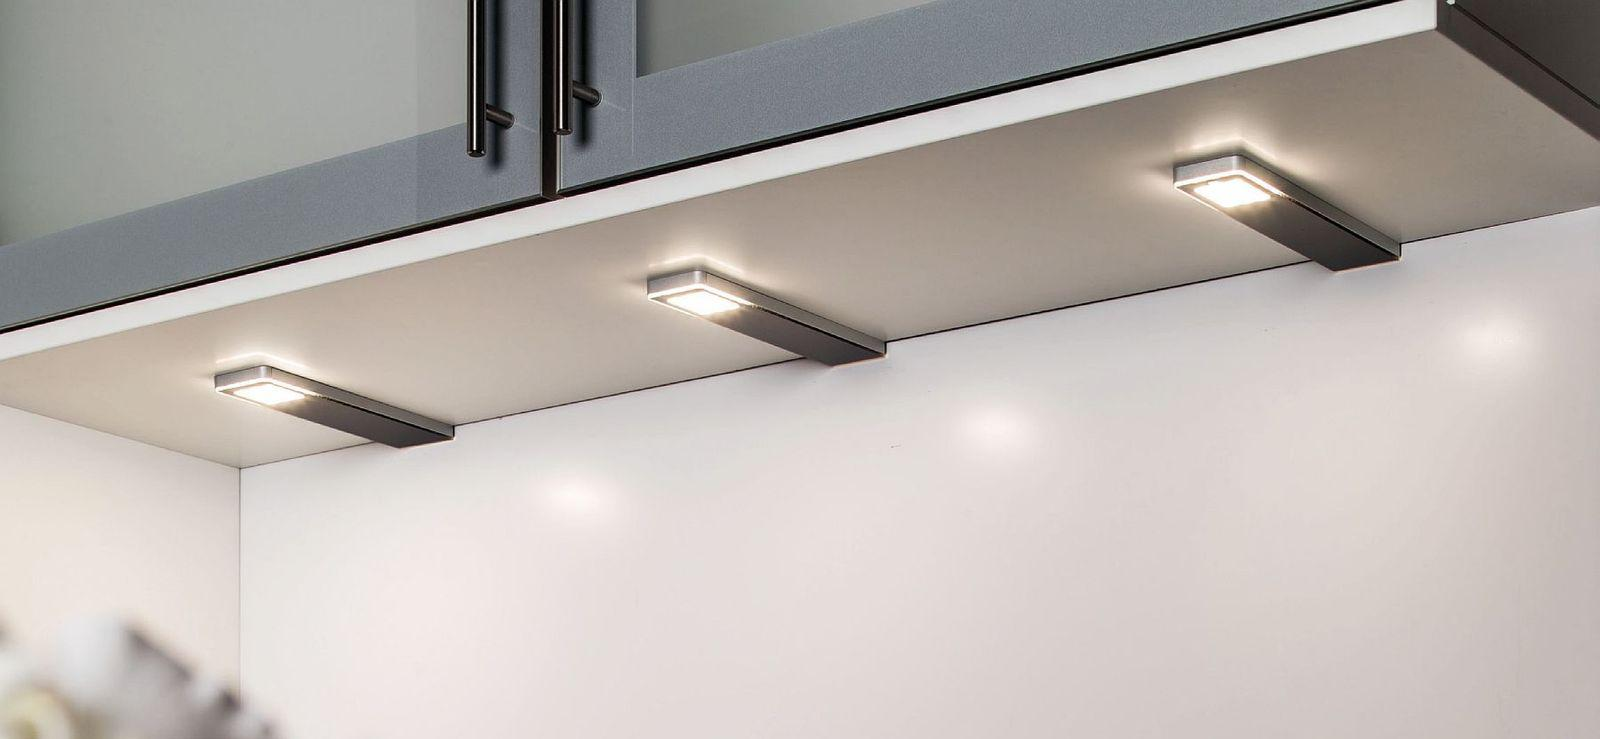 Emejing Küchen Unterbauleuchte Led Contemporary - Unintendedfarms.us ...